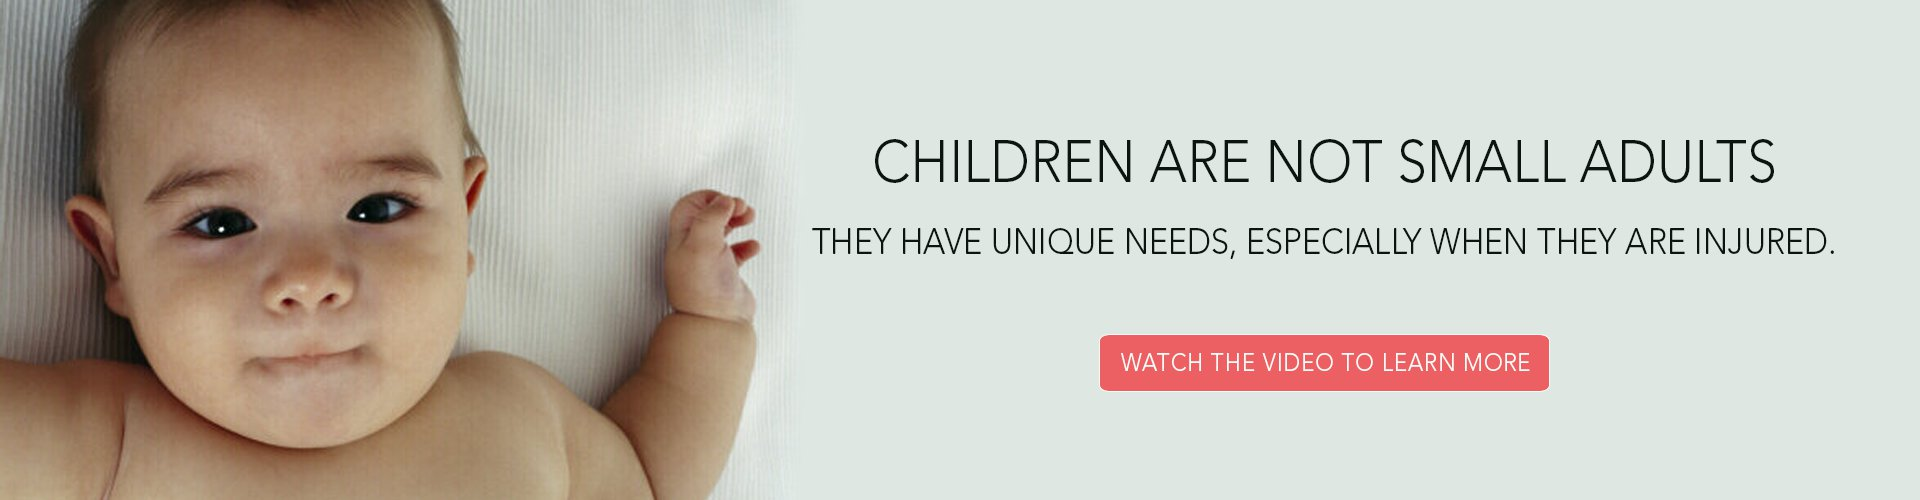 Pediatric Trauma Center, Orange County